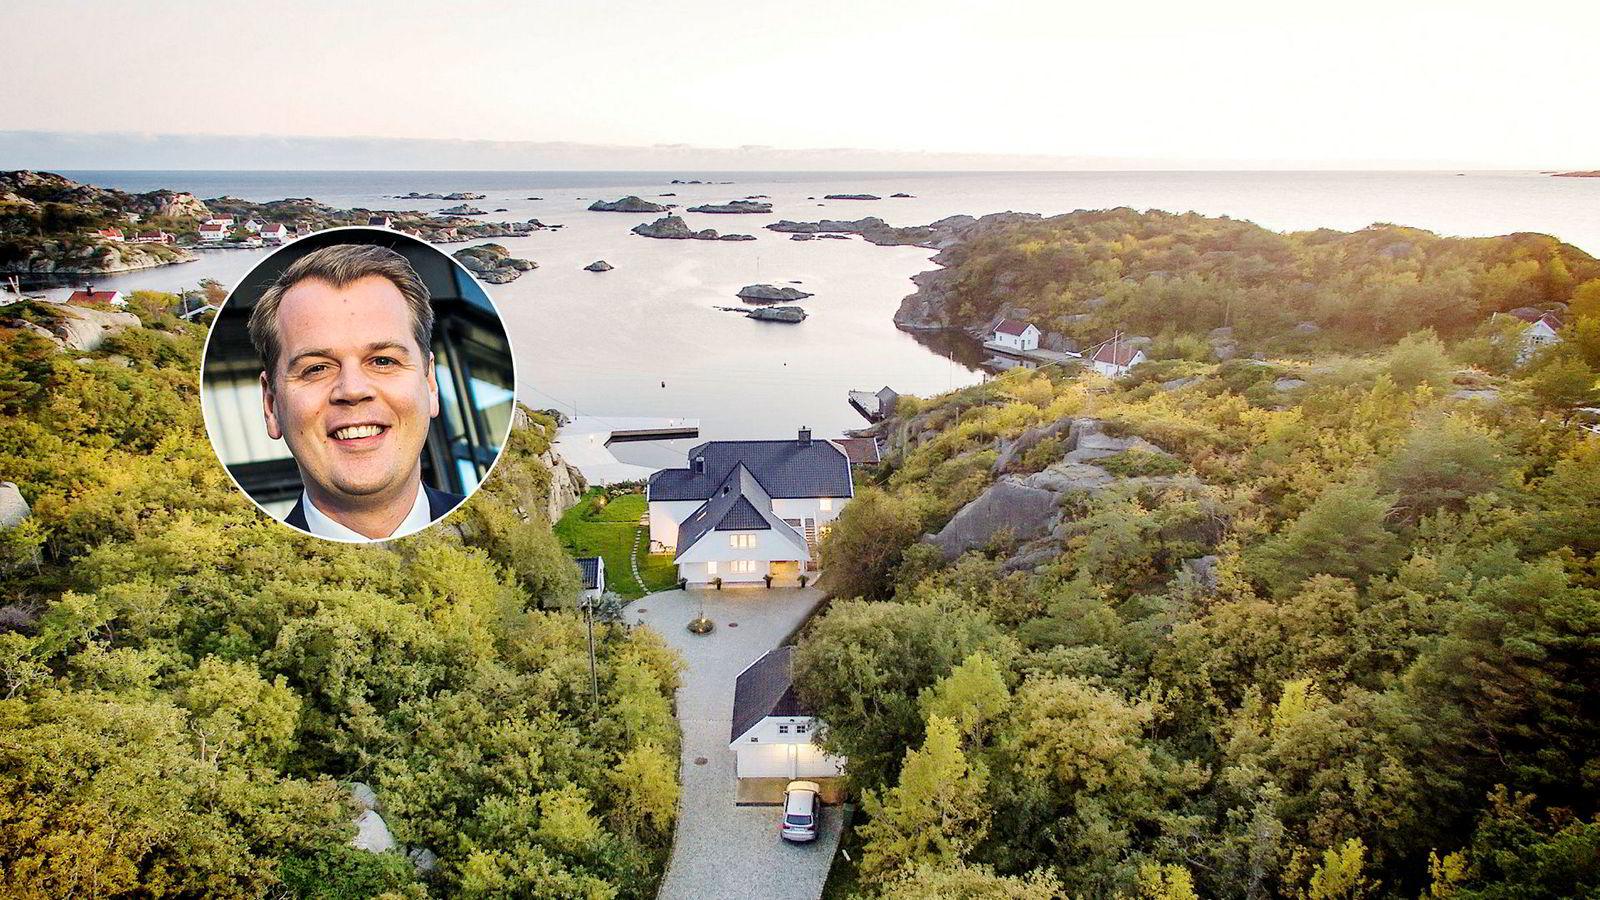 Oslo, Norge, 25-11-2014:Frontline resultater 3Q. Administrerende direktør Robert Hvide Macleod på kontoret på Aker Brygge. Foto: Gunnar Blöndal ---